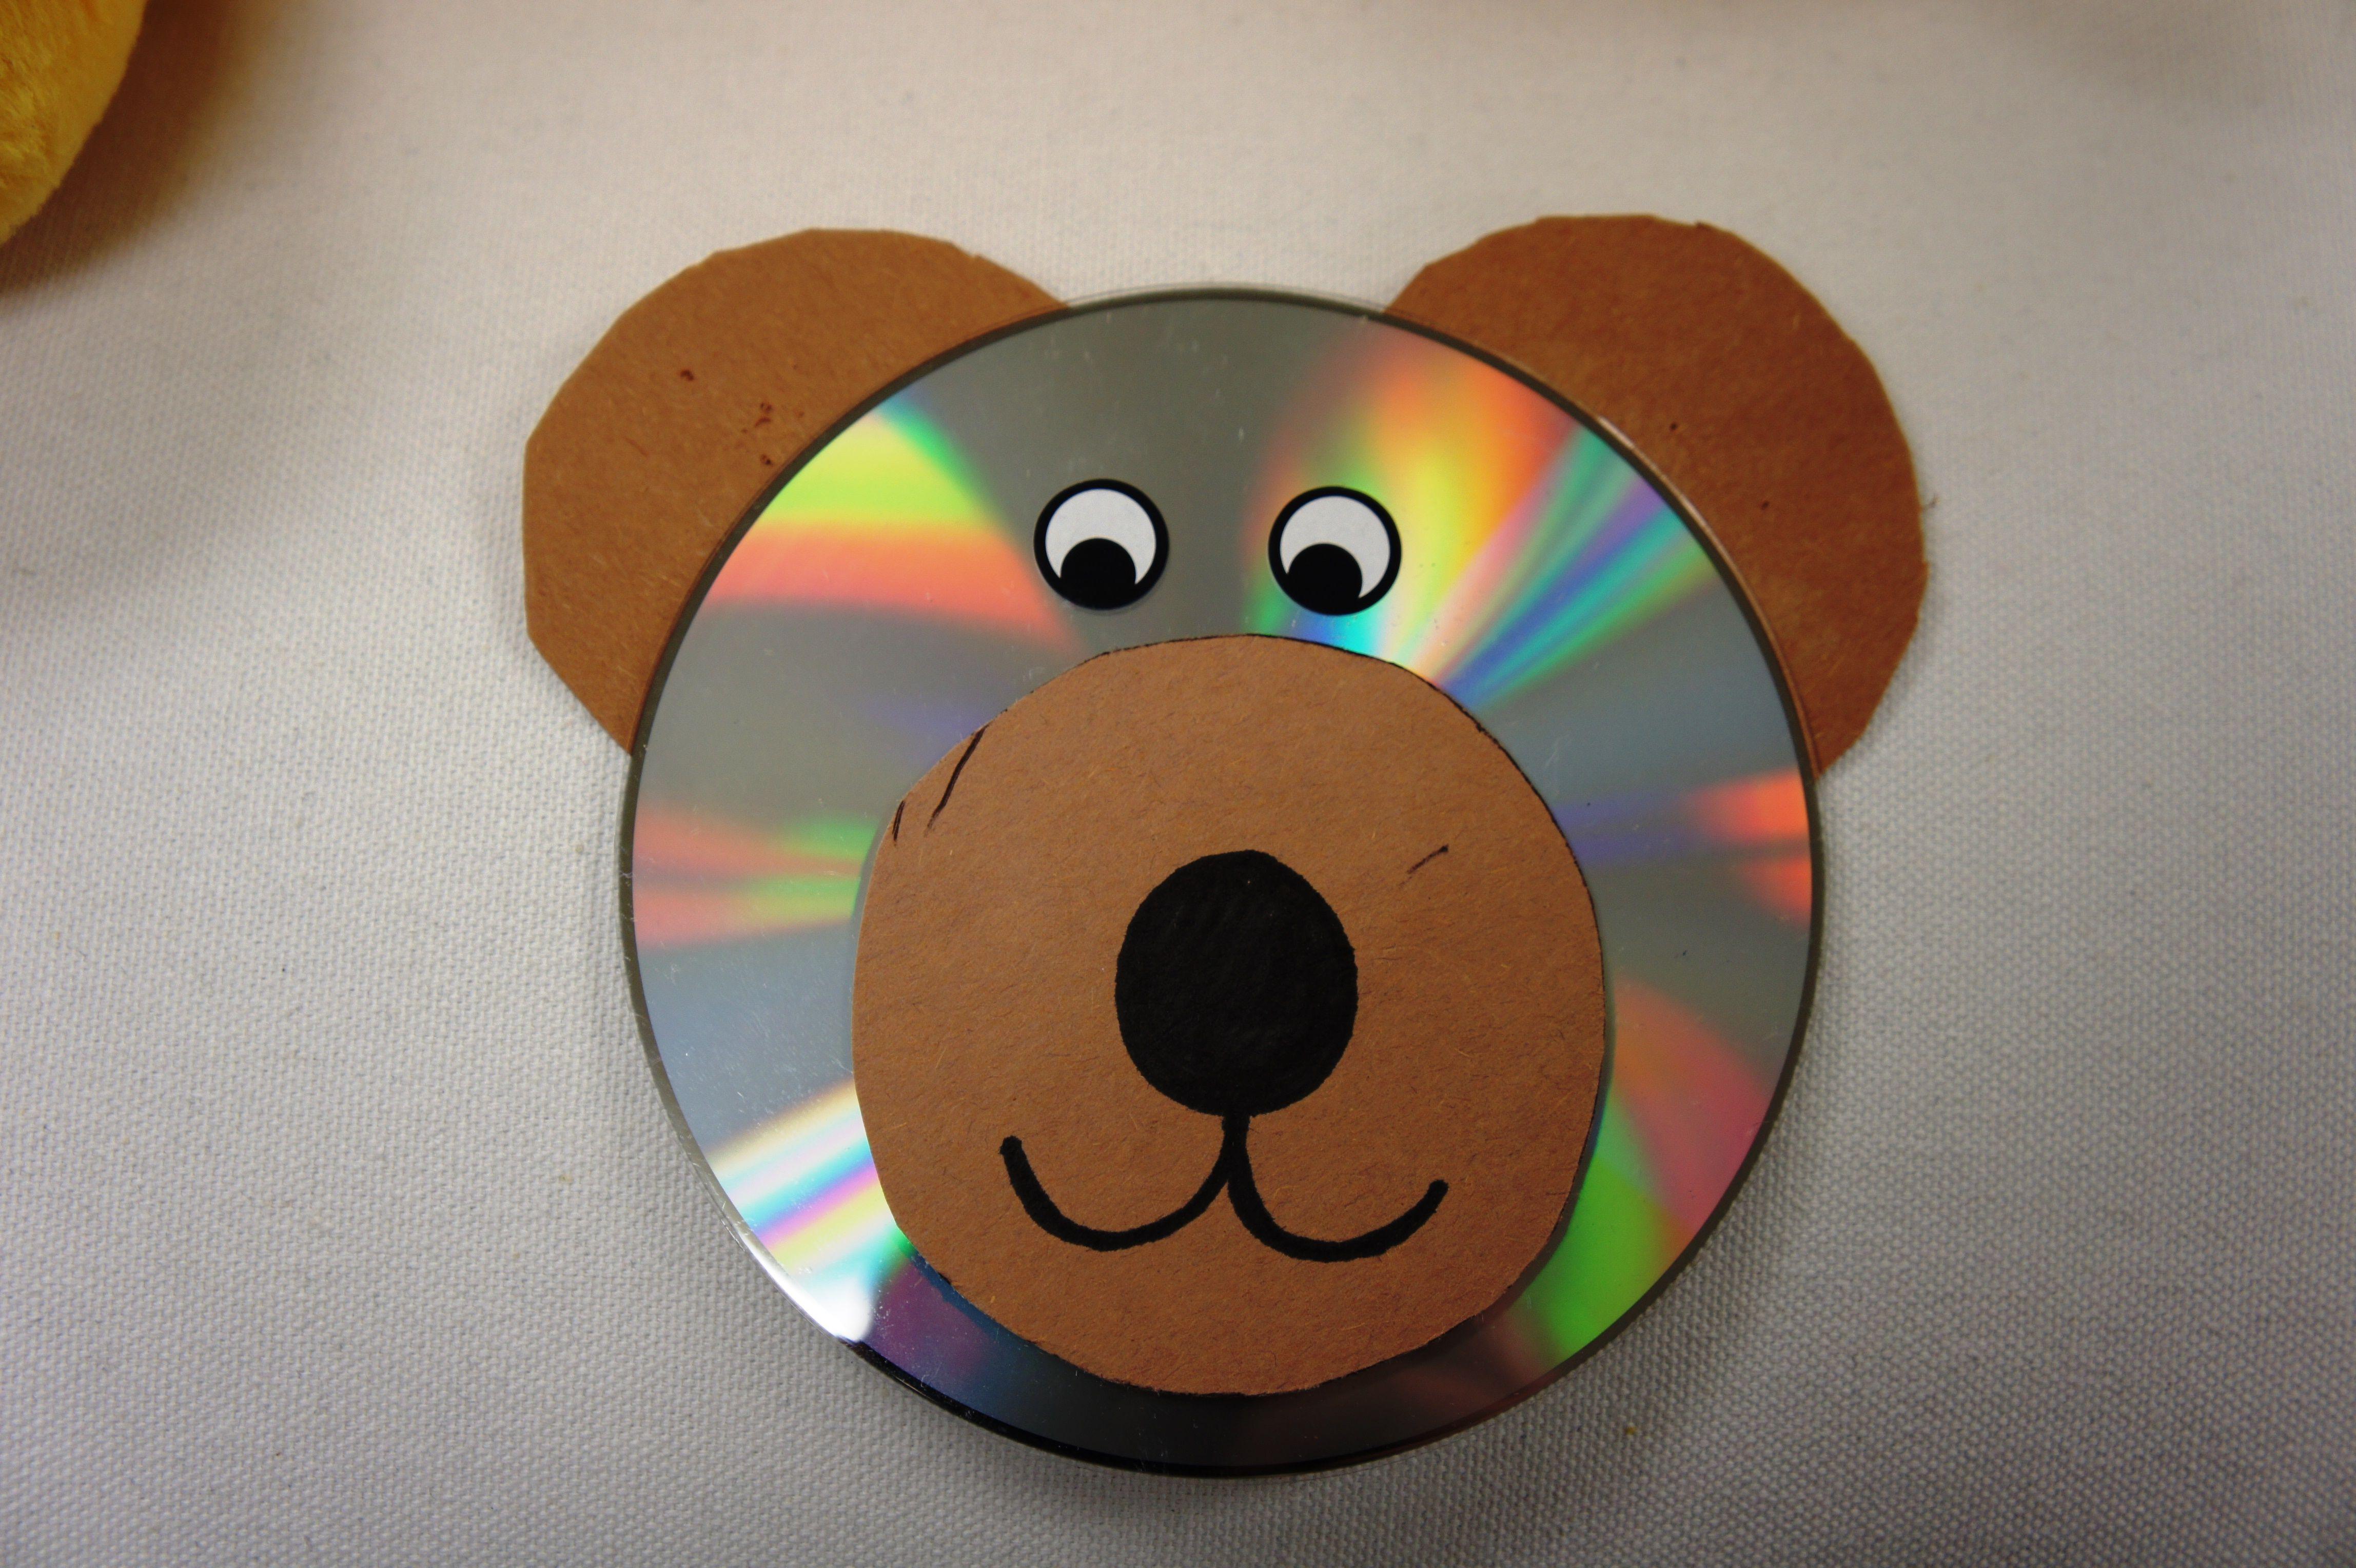 Teddy Bears Picnic Panosundaki Pin